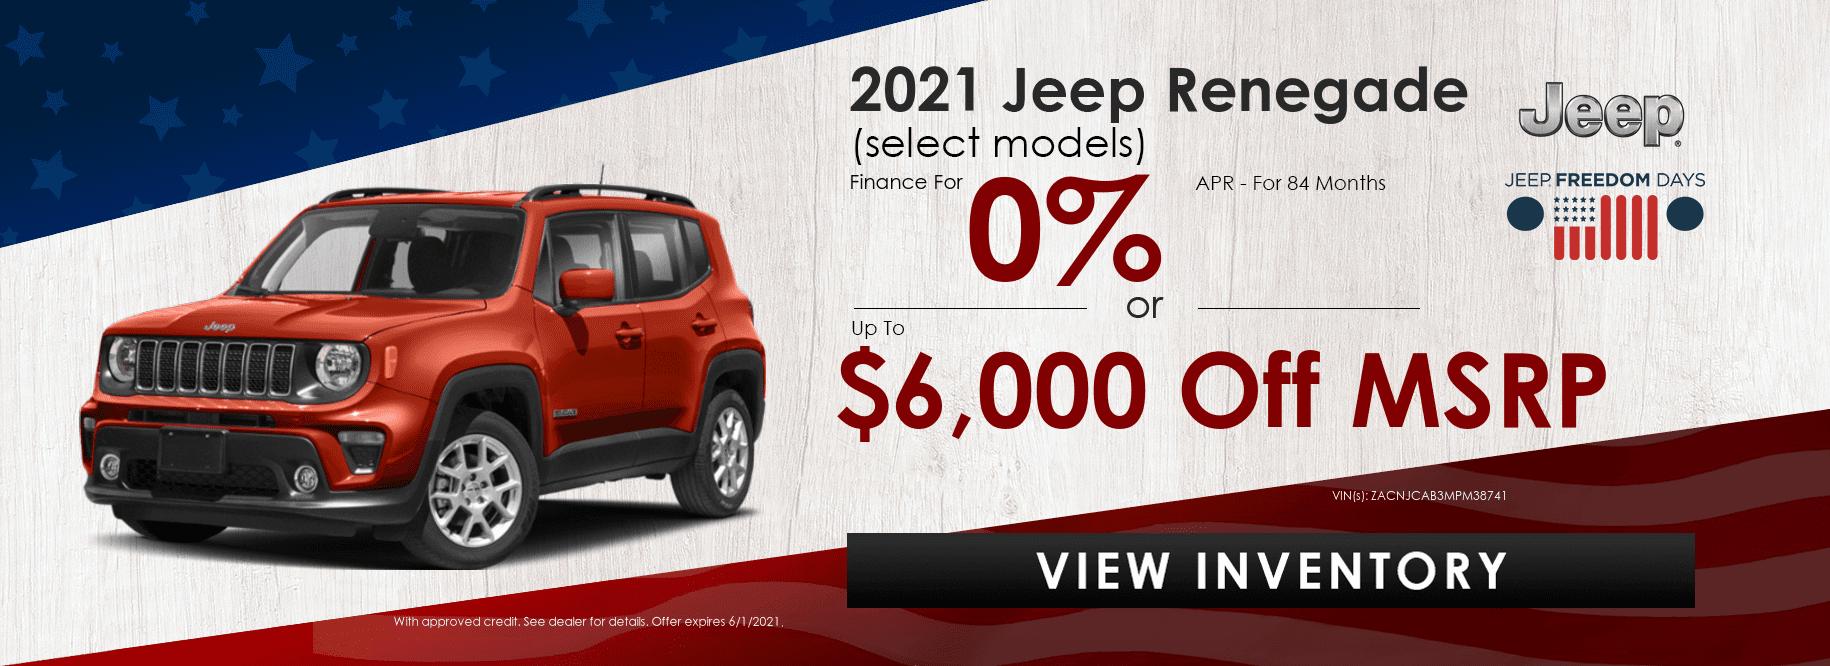 2021-Jeep-Renegade-(select-models)-72